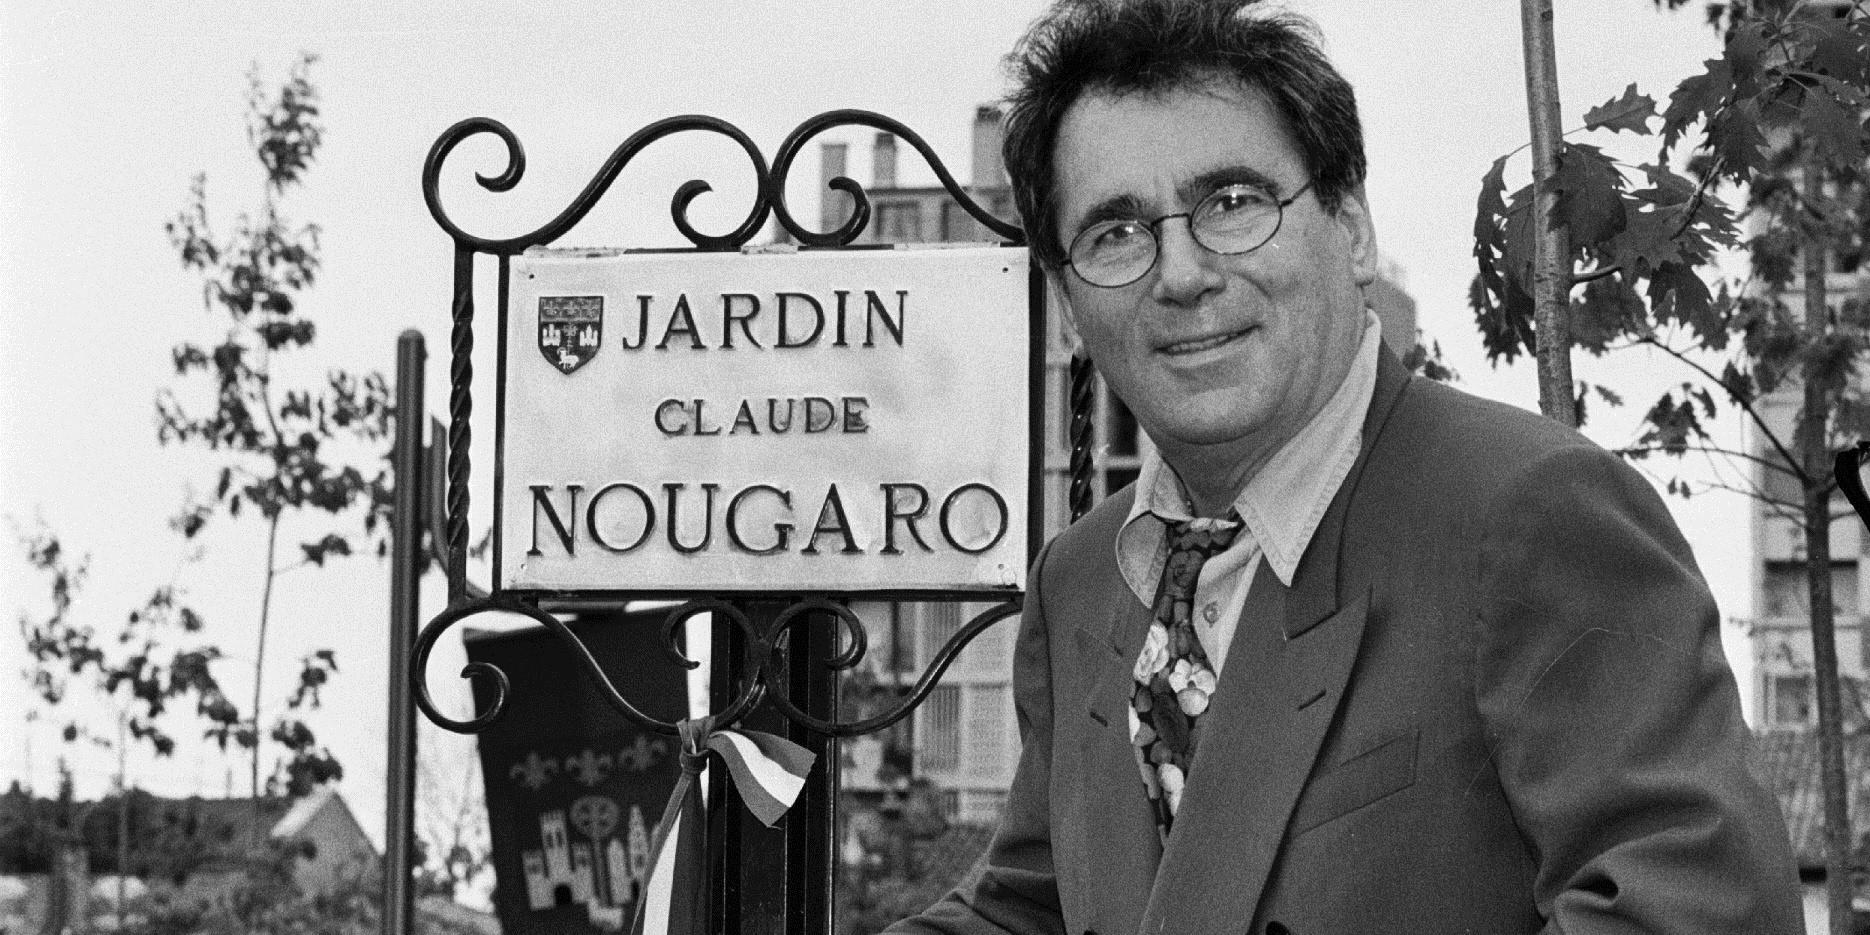 AndJazz: Claude Nougaro